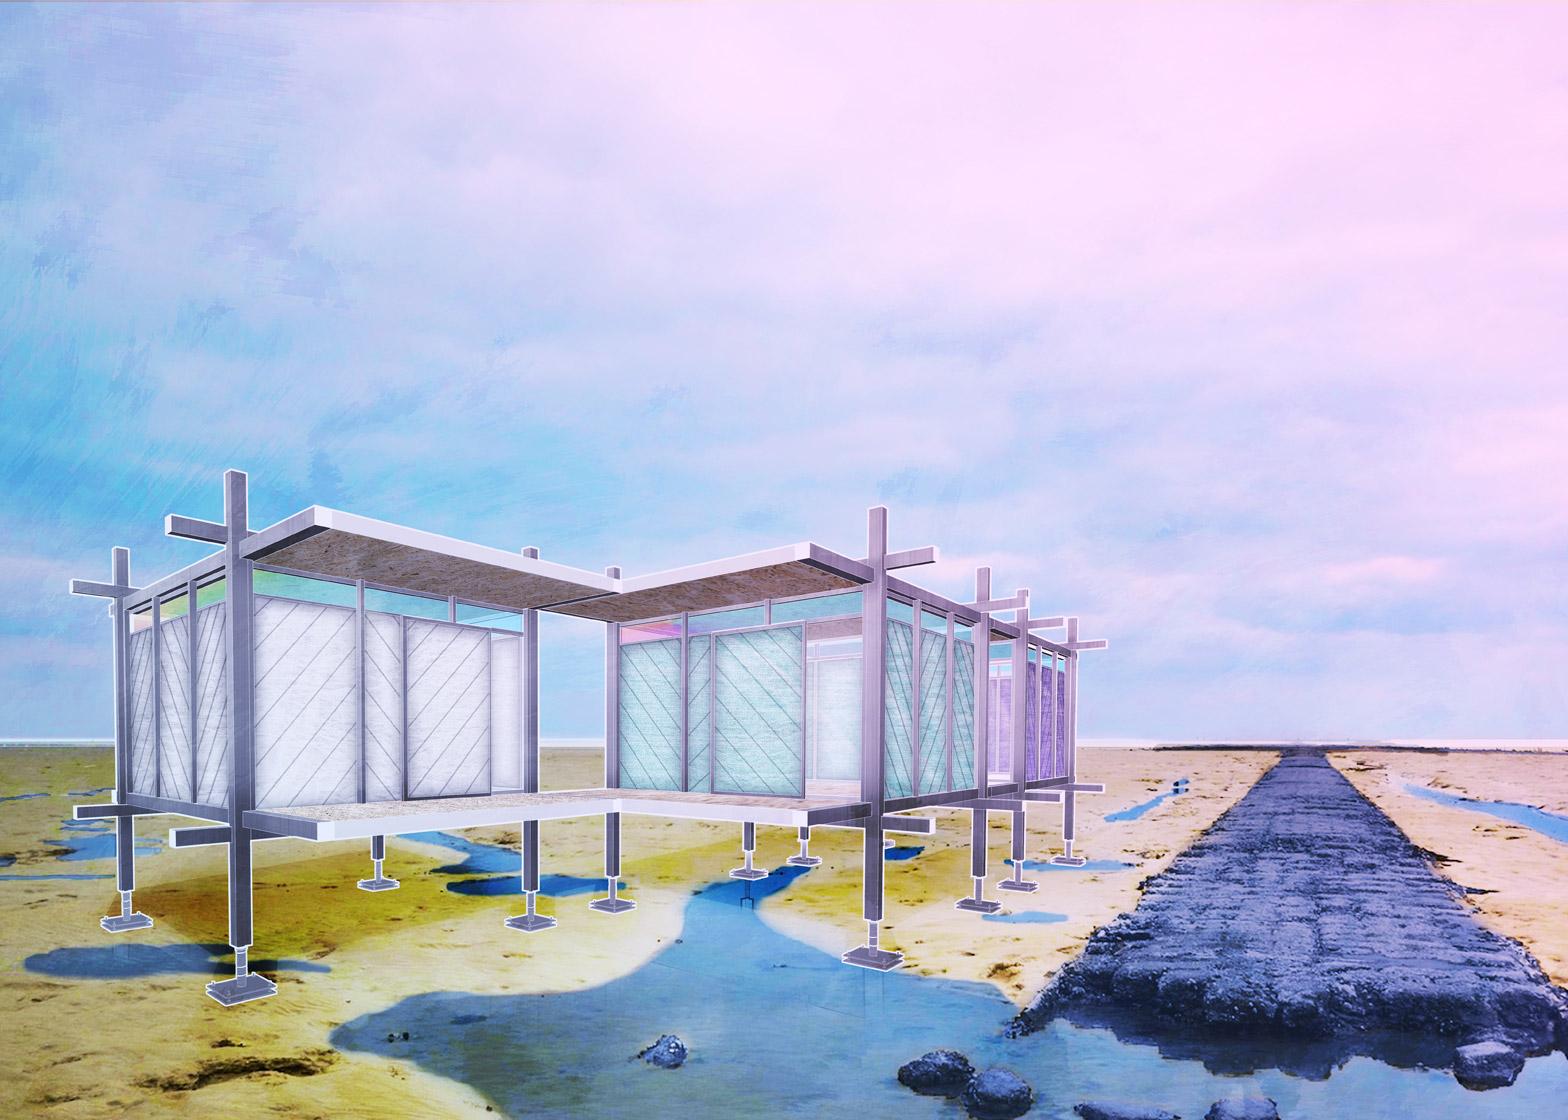 Prefabricated housing by Tom Dixon